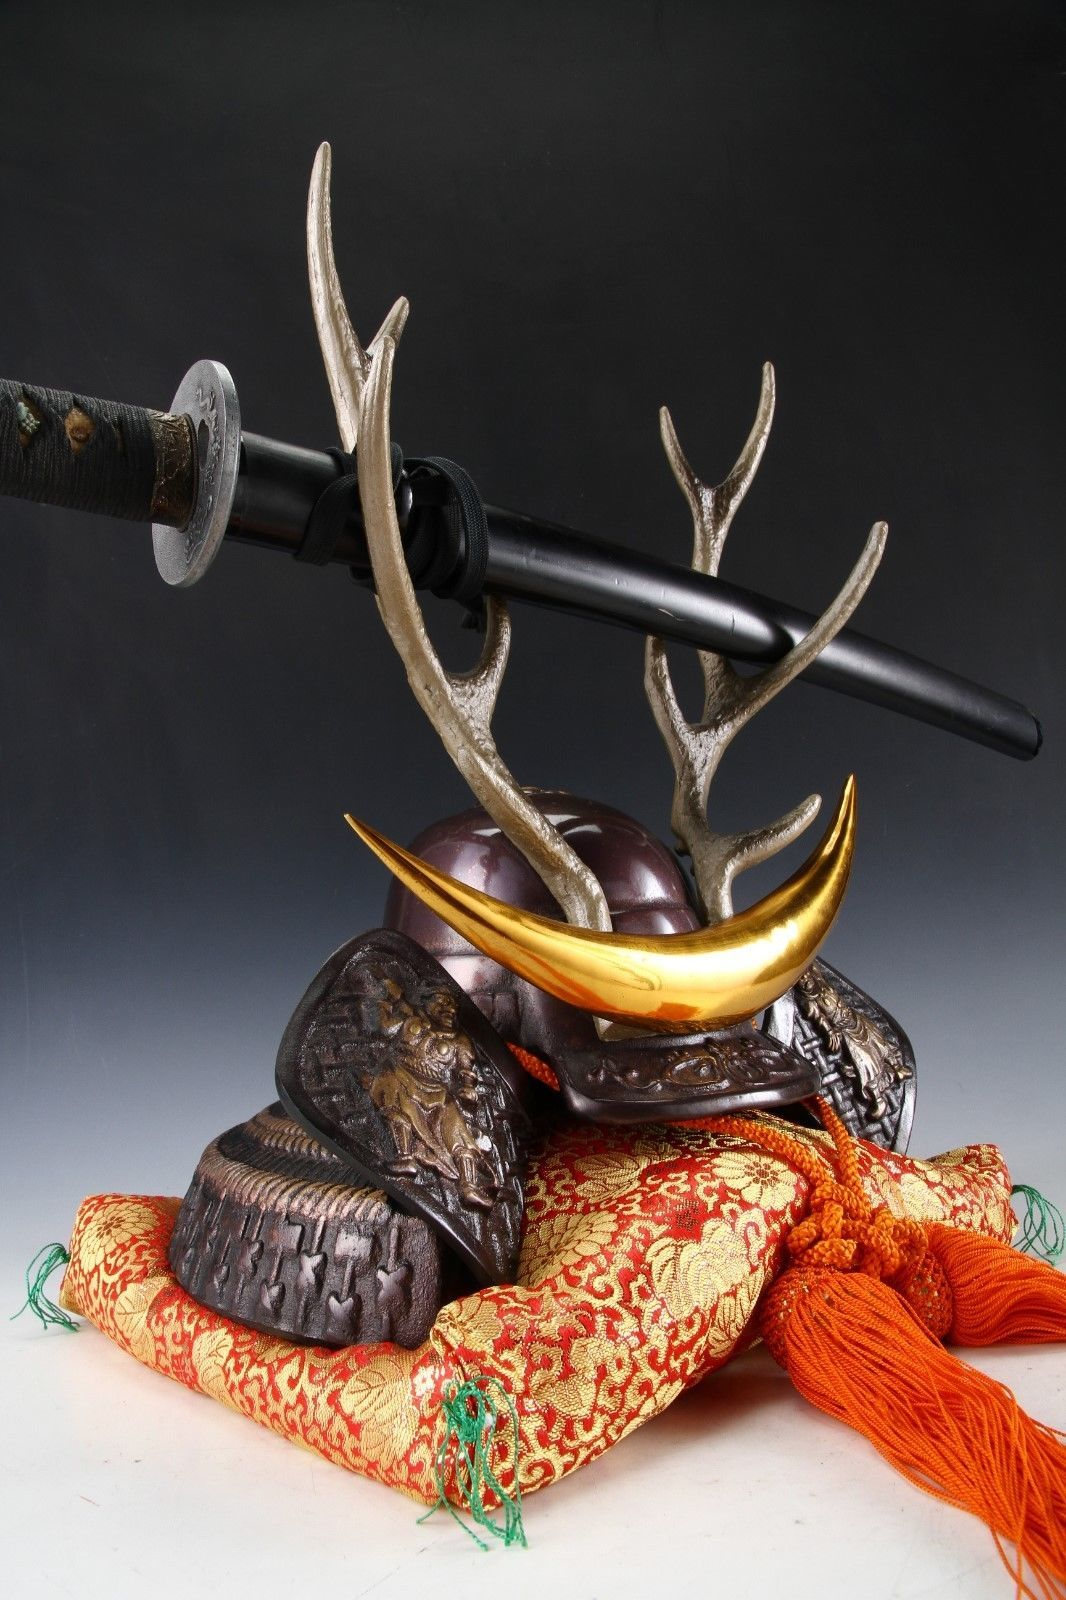 Japanese Beautiful Samurai Helmet -shikanosuke kabuto- with a Replica Blade image 7